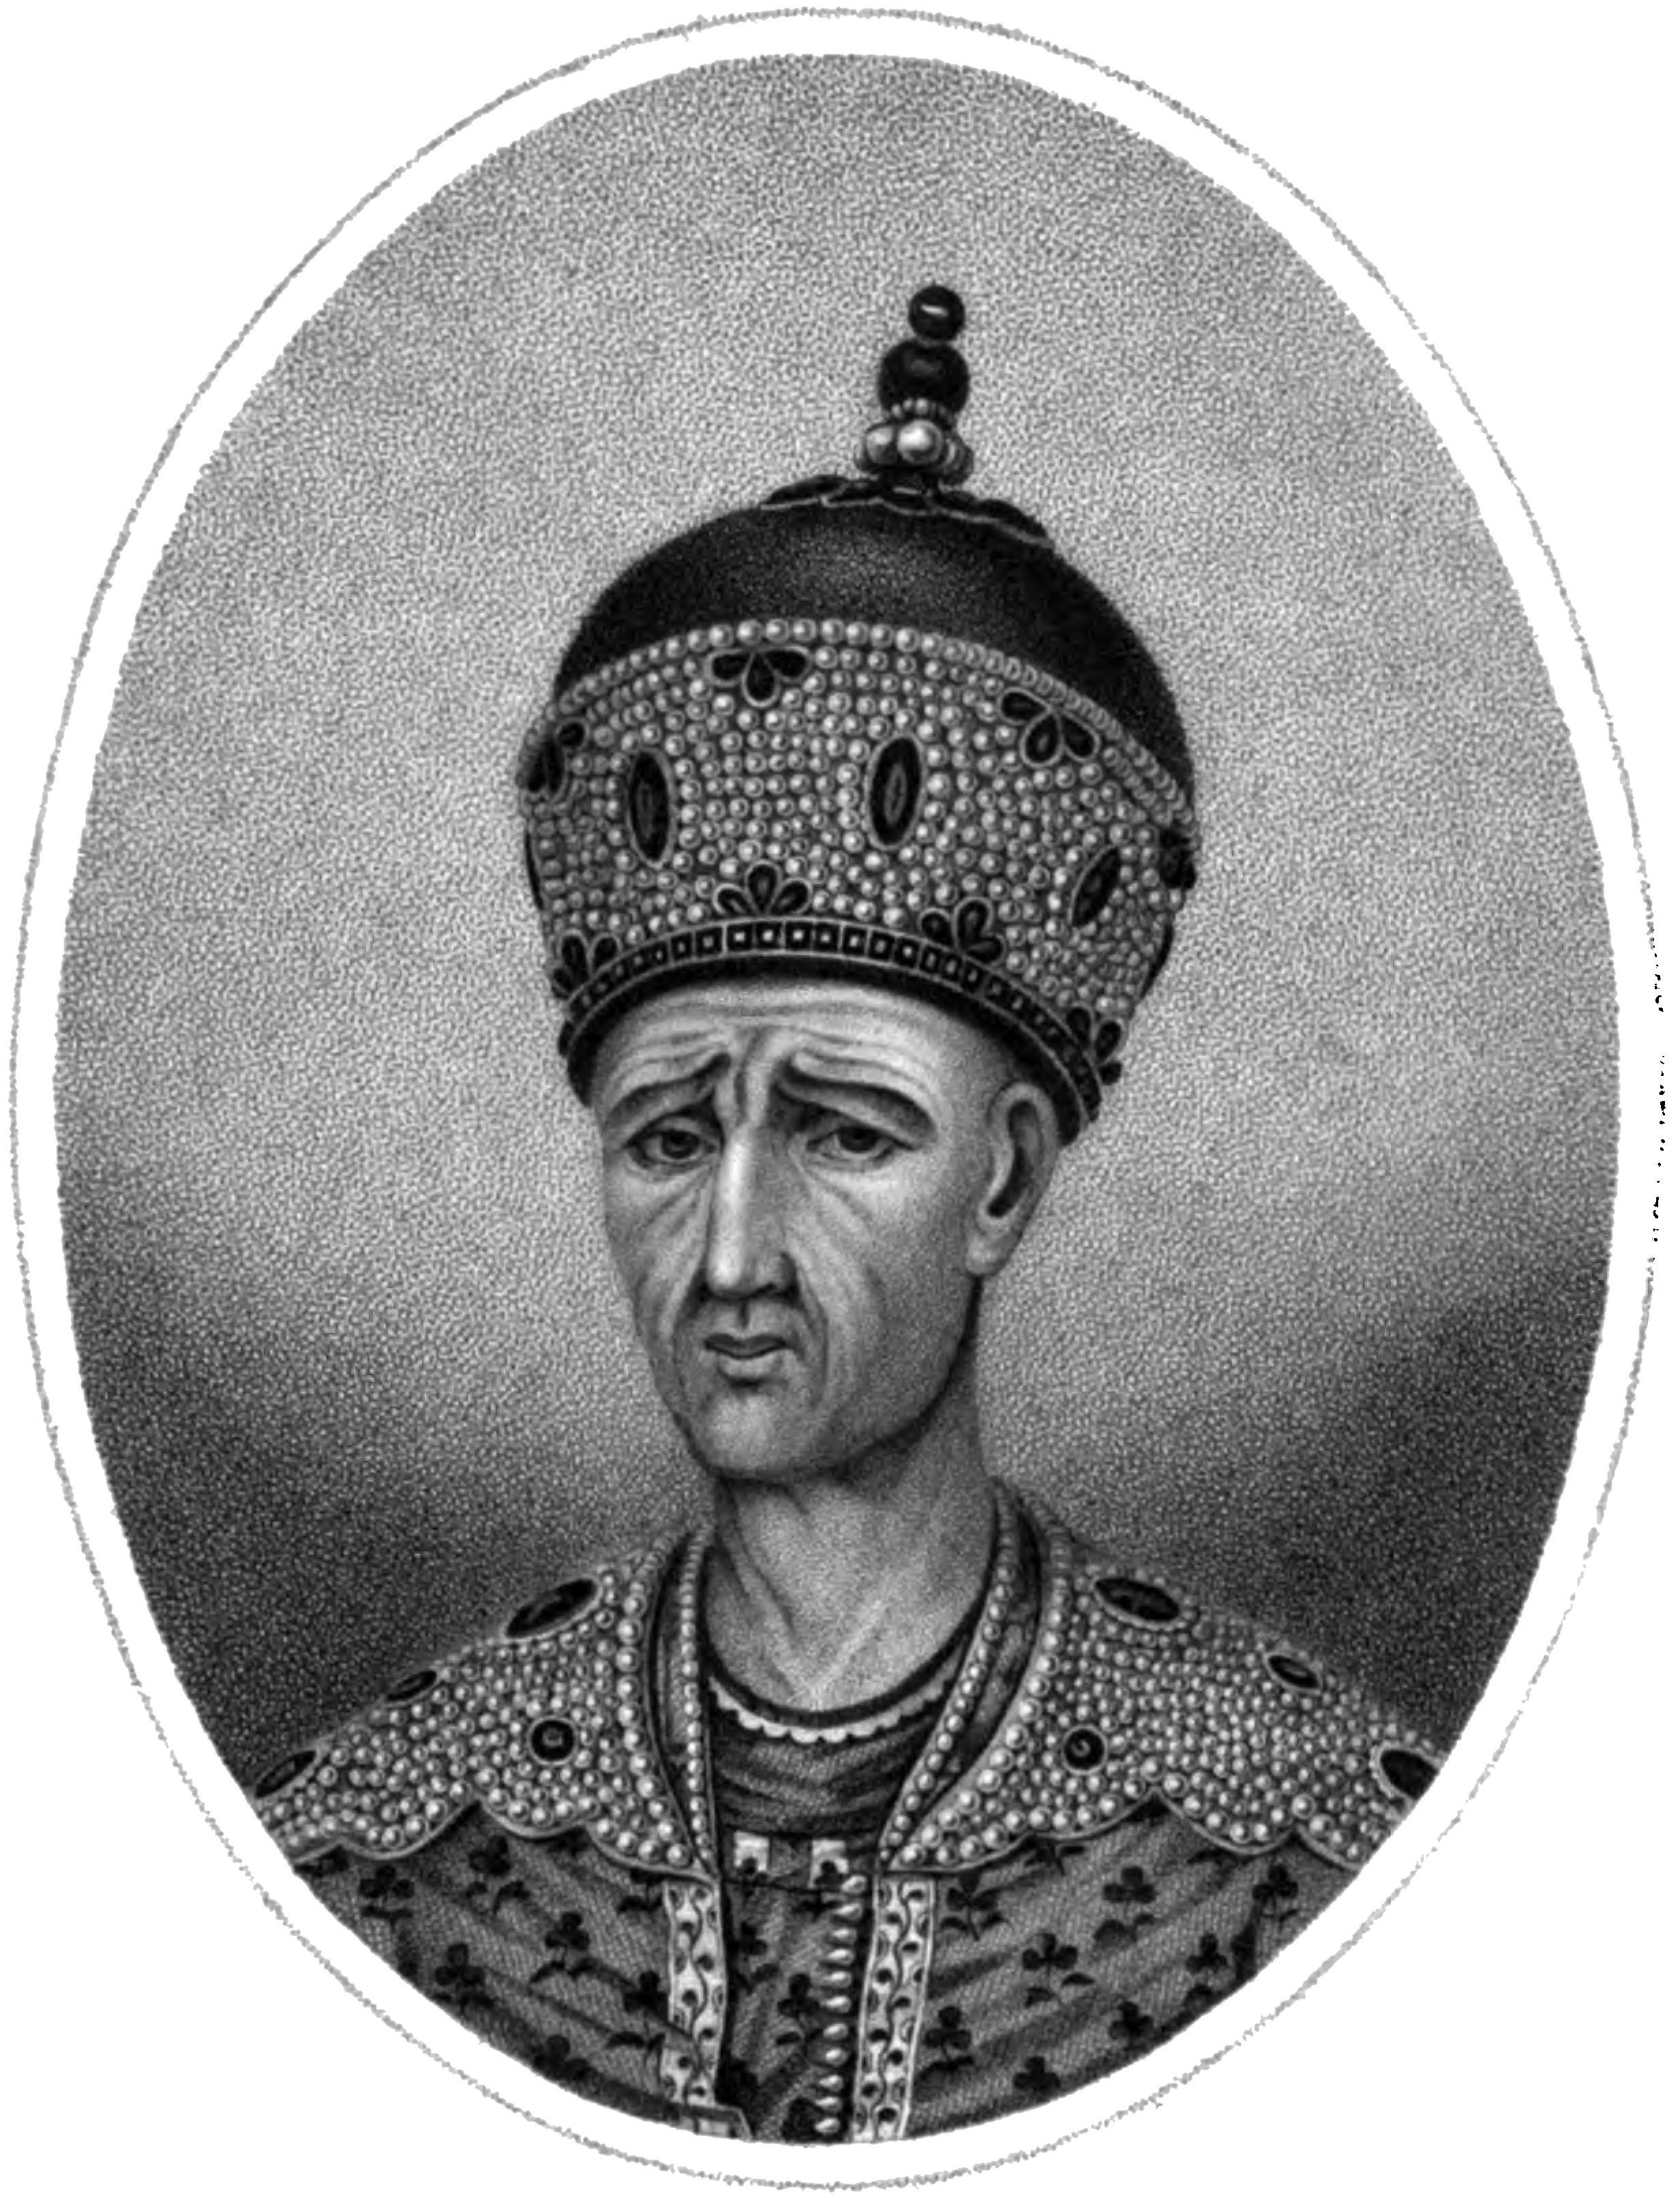 https://upload.wikimedia.org/wikipedia/commons/0/0c/Mohammad_Khan_Qajar.jpg